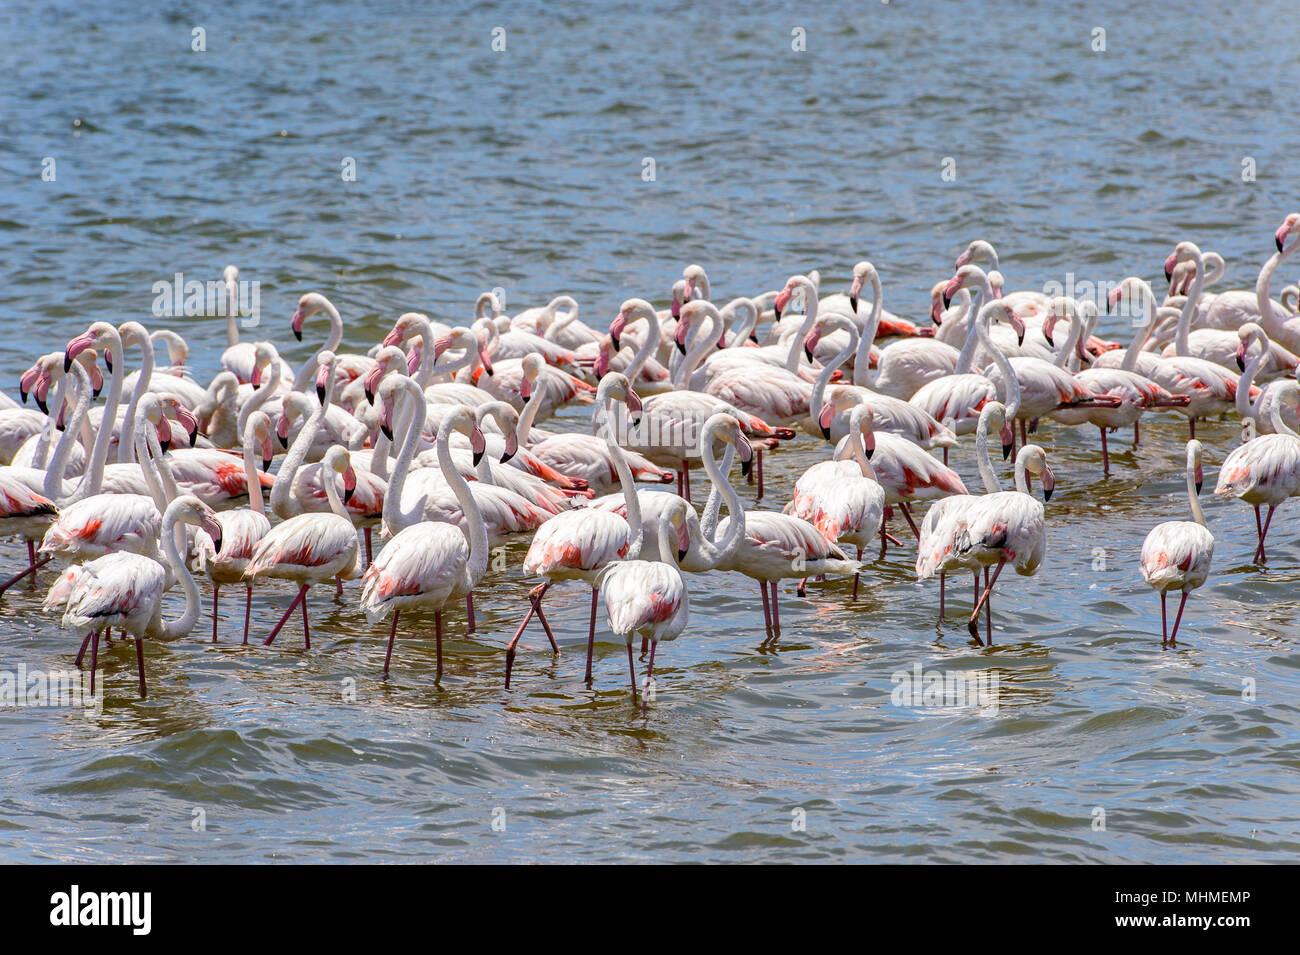 Flamingo nell'oceano Immagini Stock